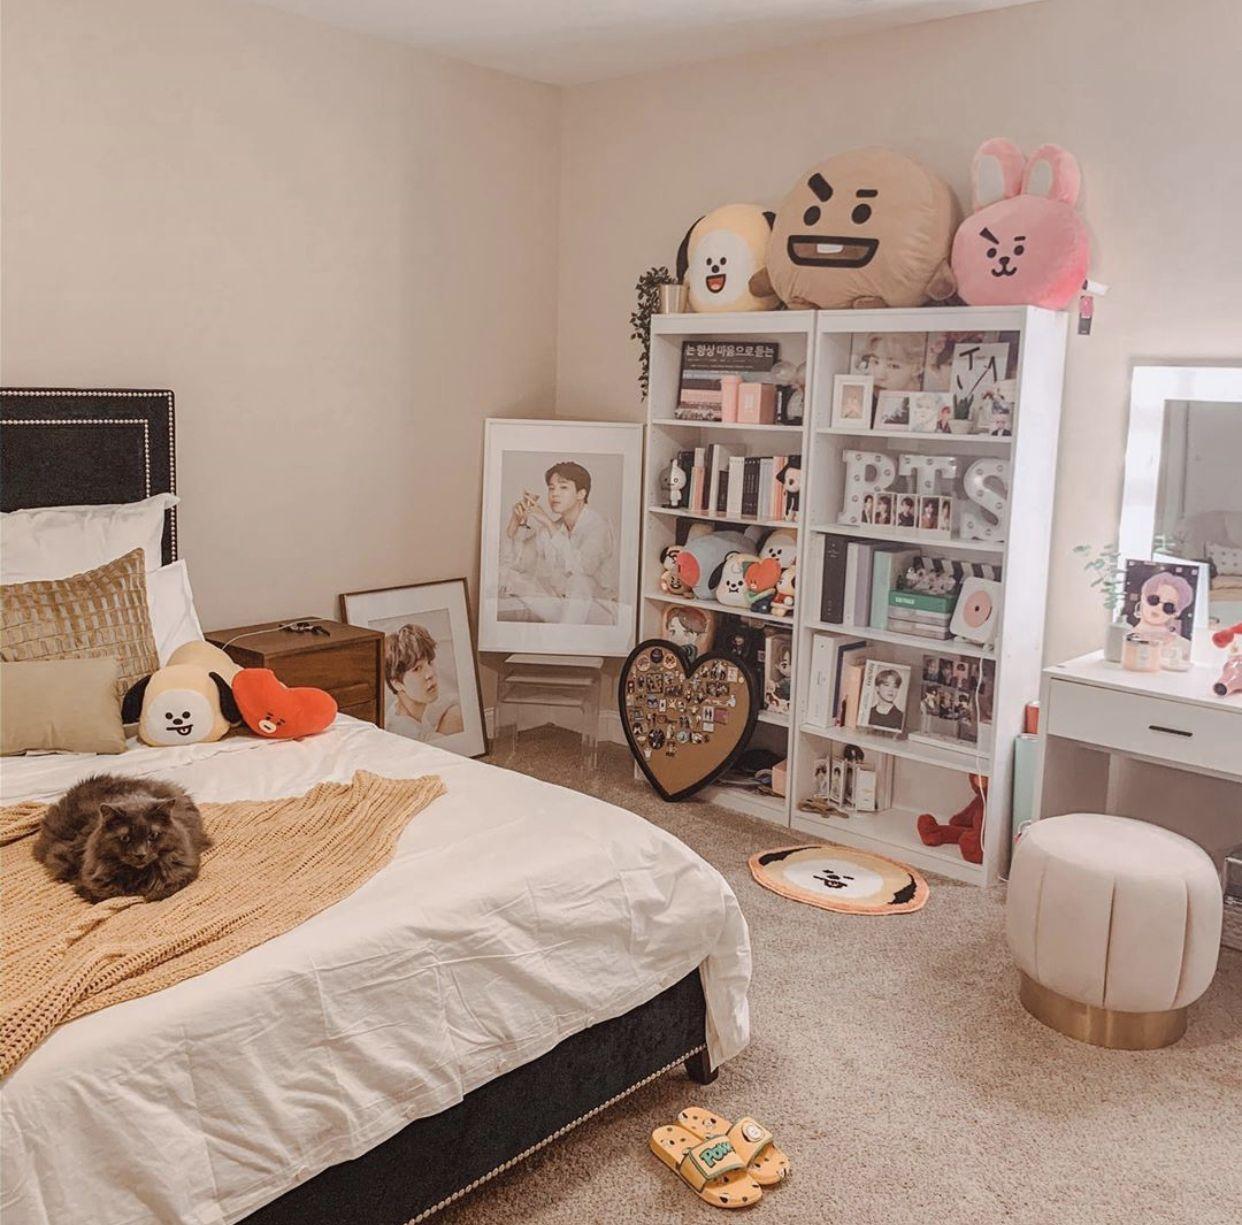 #bts #kpop #btsdecor #bedroom #bedroomdecor #kpoproom # ... on Room Decor Bts id=31507